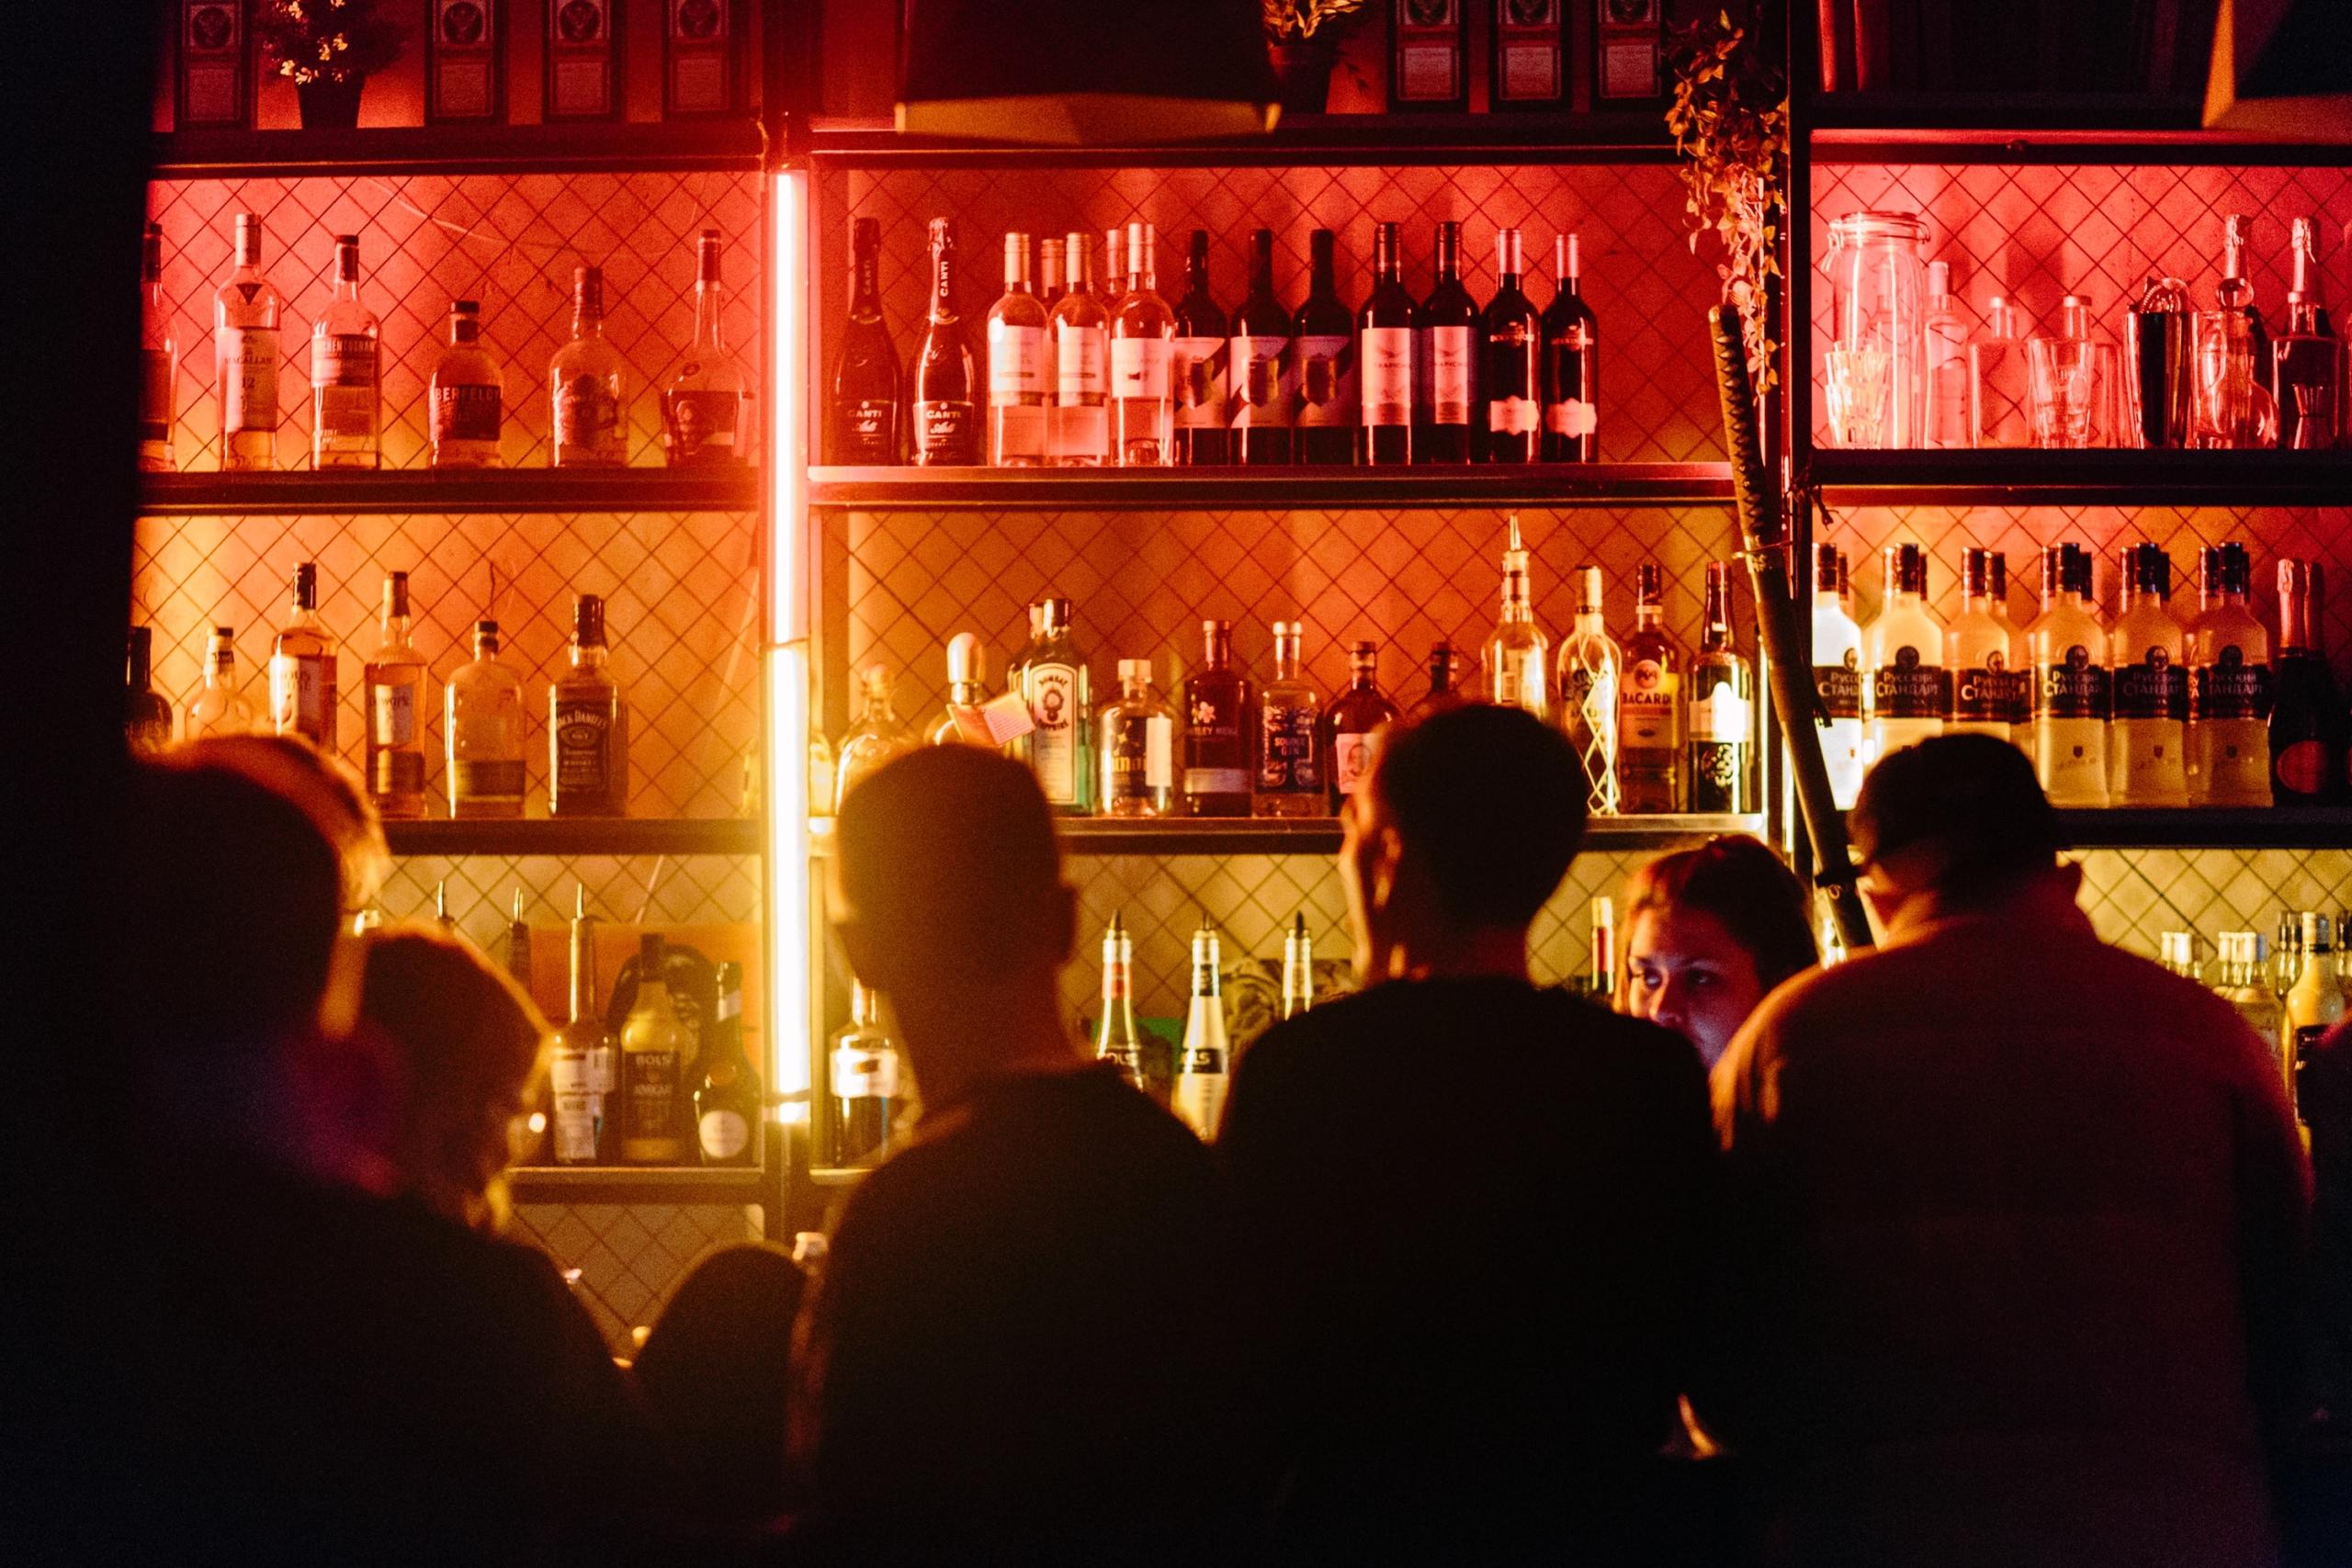 Scottsdale Nightlife & Bars: Pattie's Irish Pub